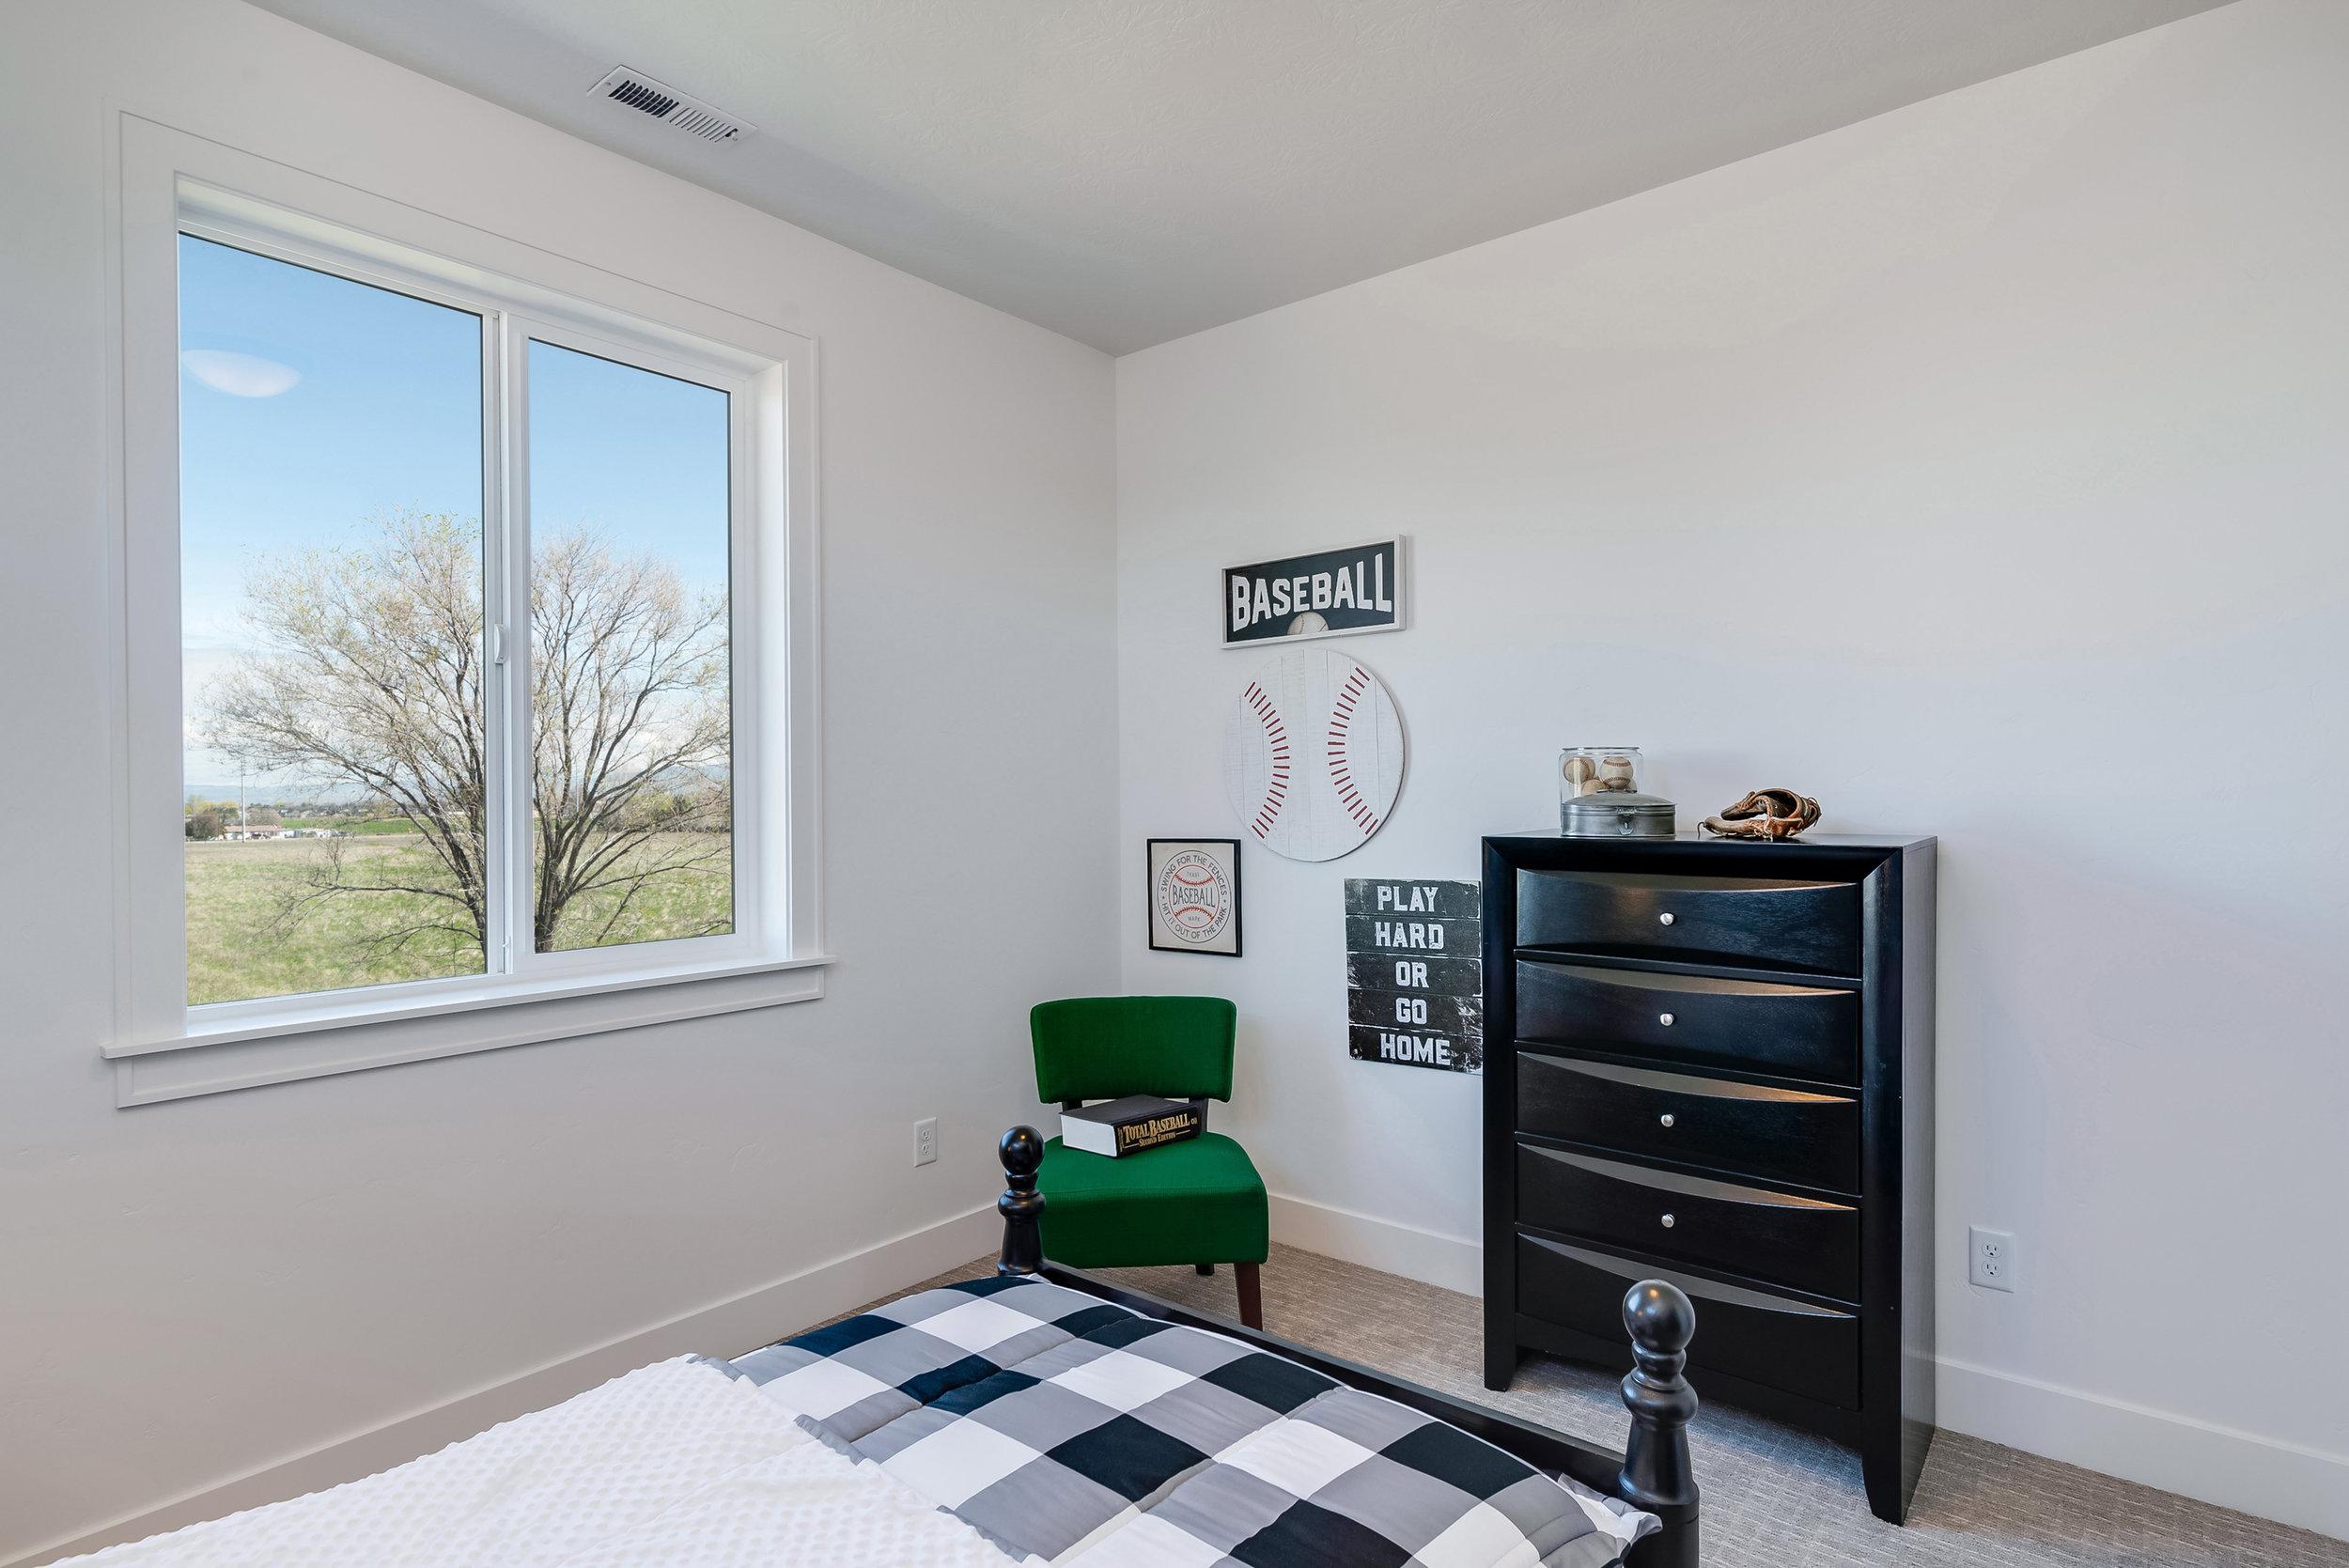 52-Bedroom.jpg